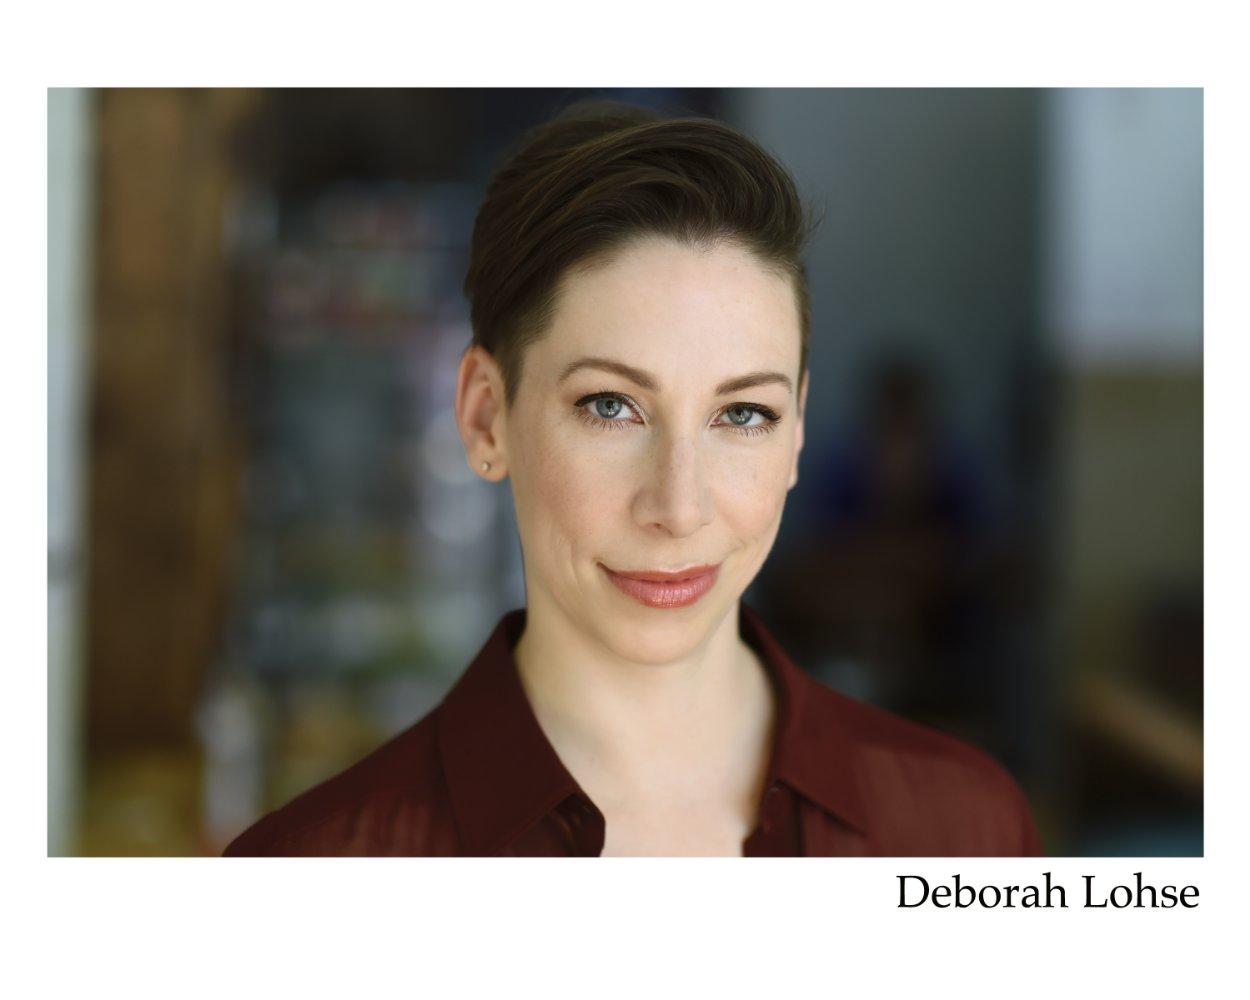 Deborah Lohse